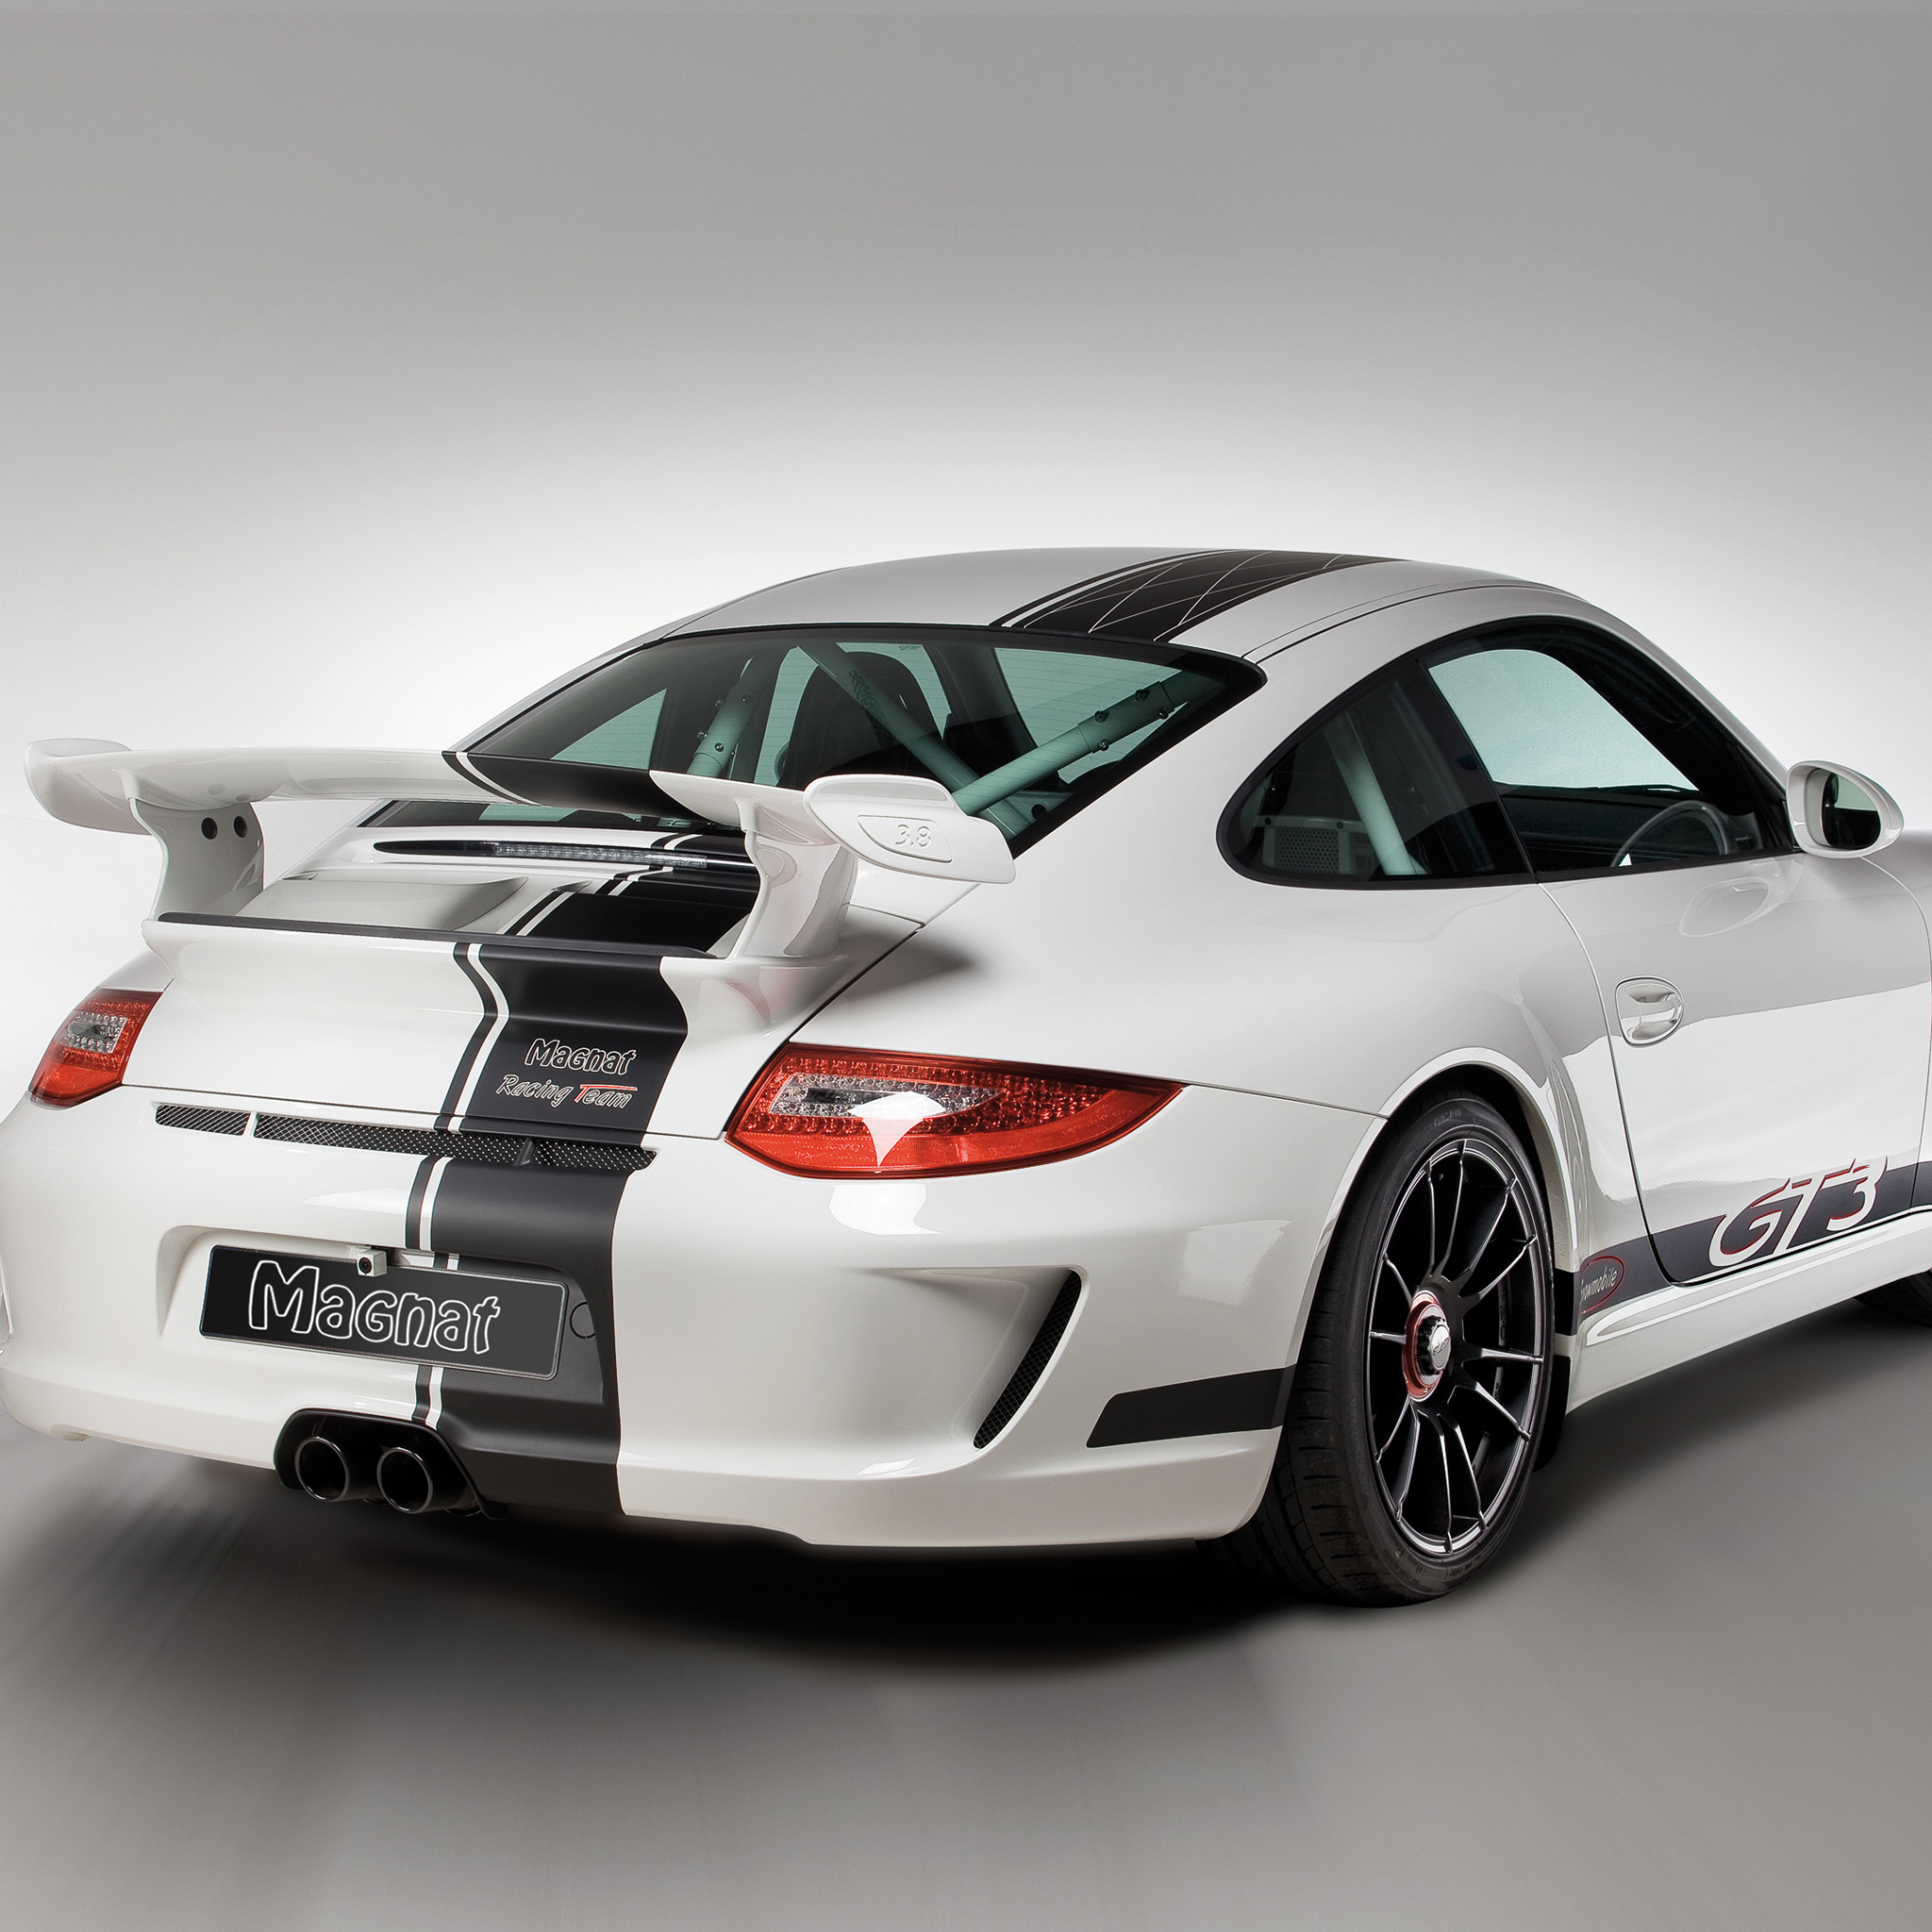 2011 Porsche 911 3Wallpapers iPad Retina 2011 Porsche 911   iPad Retina